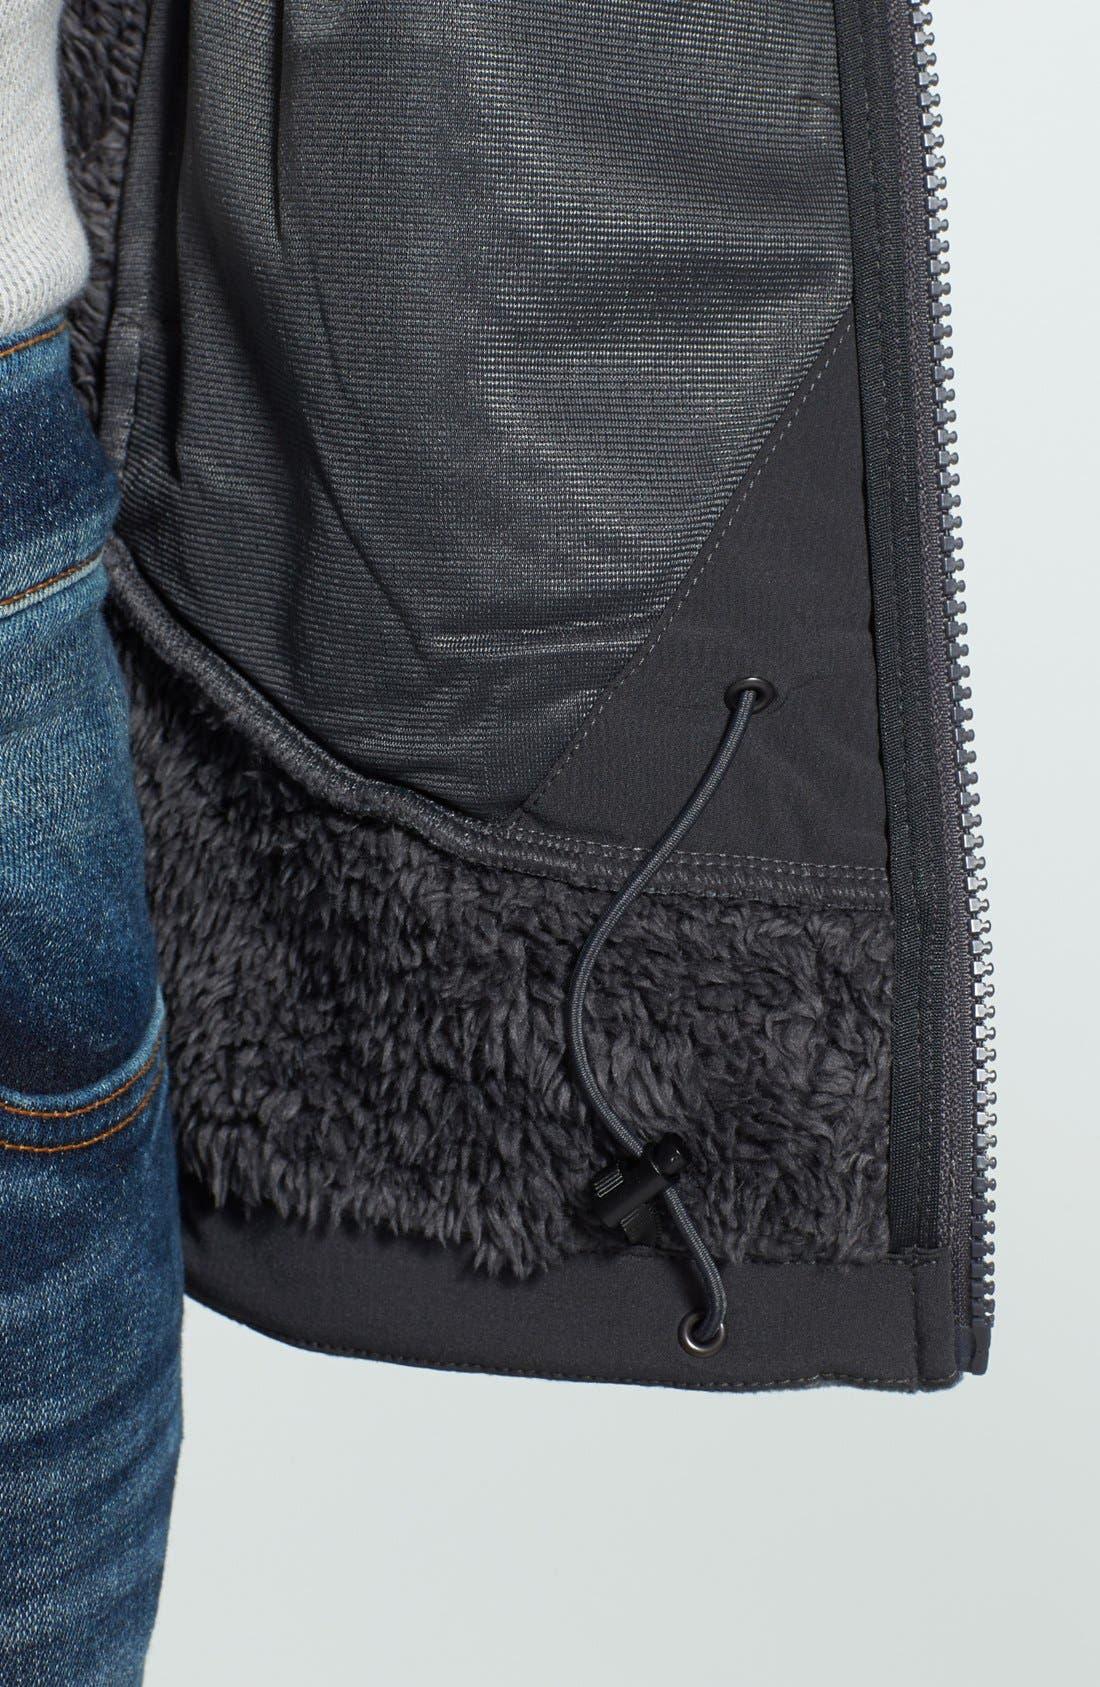 'Chimborazo' Zip Front Fleece Jacket,                             Alternate thumbnail 39, color,